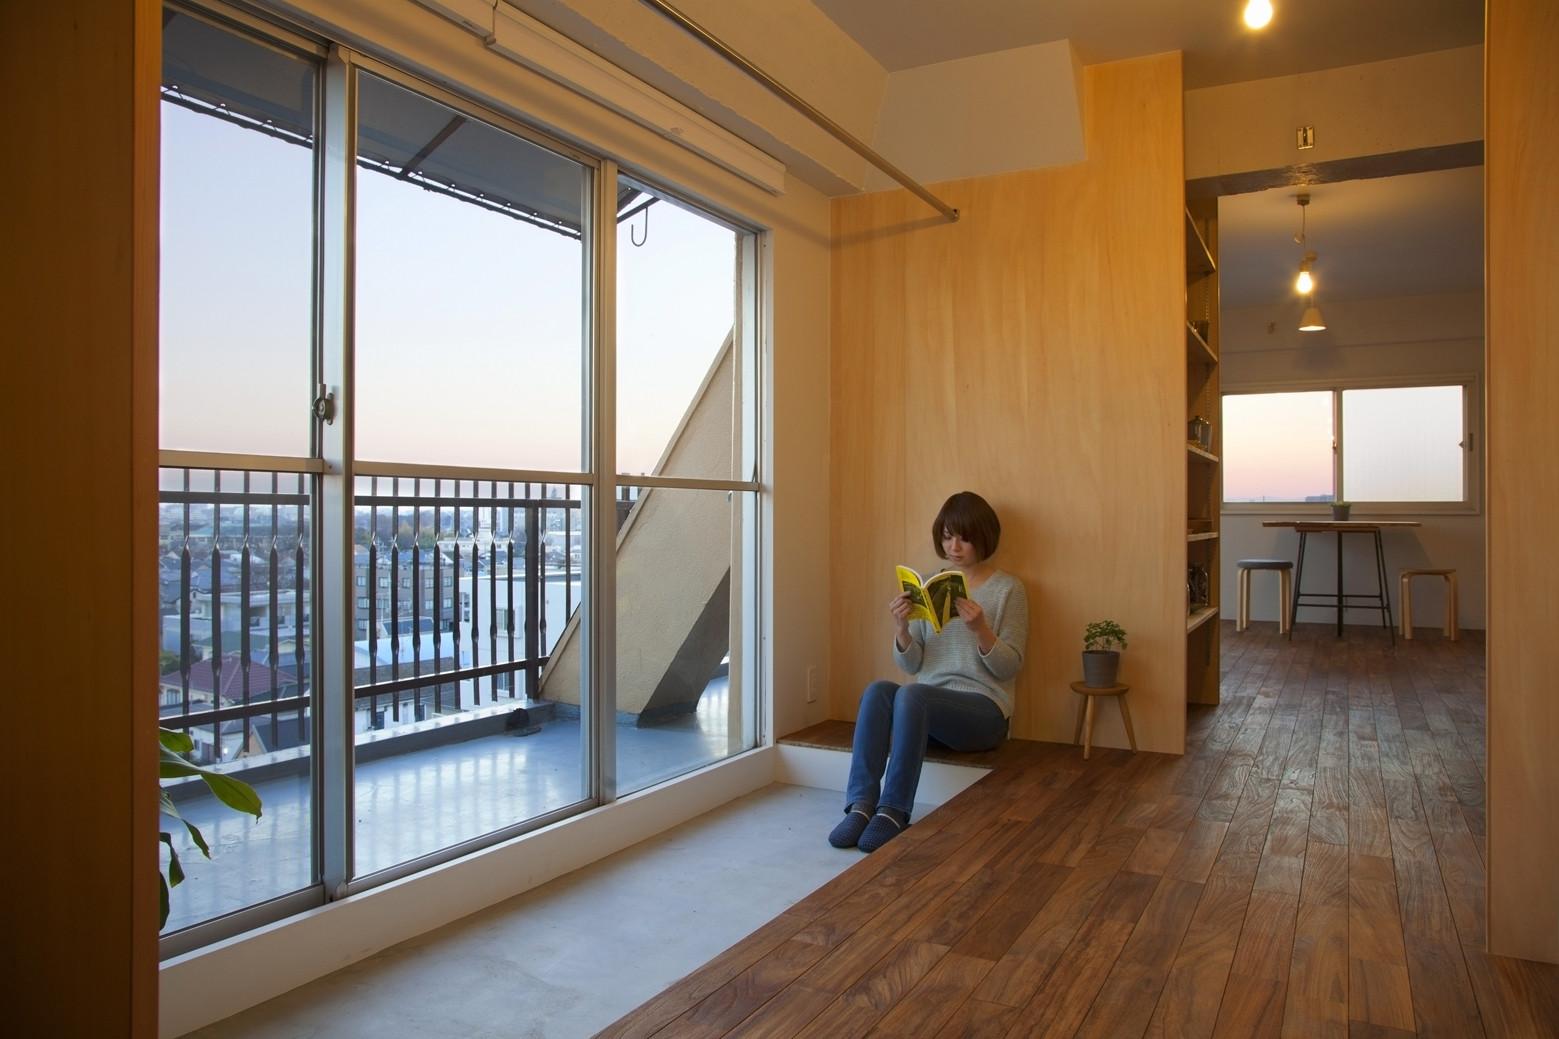 Wood Partitions Enlarge A Tiny Apartment Designs Ideas On Dornob